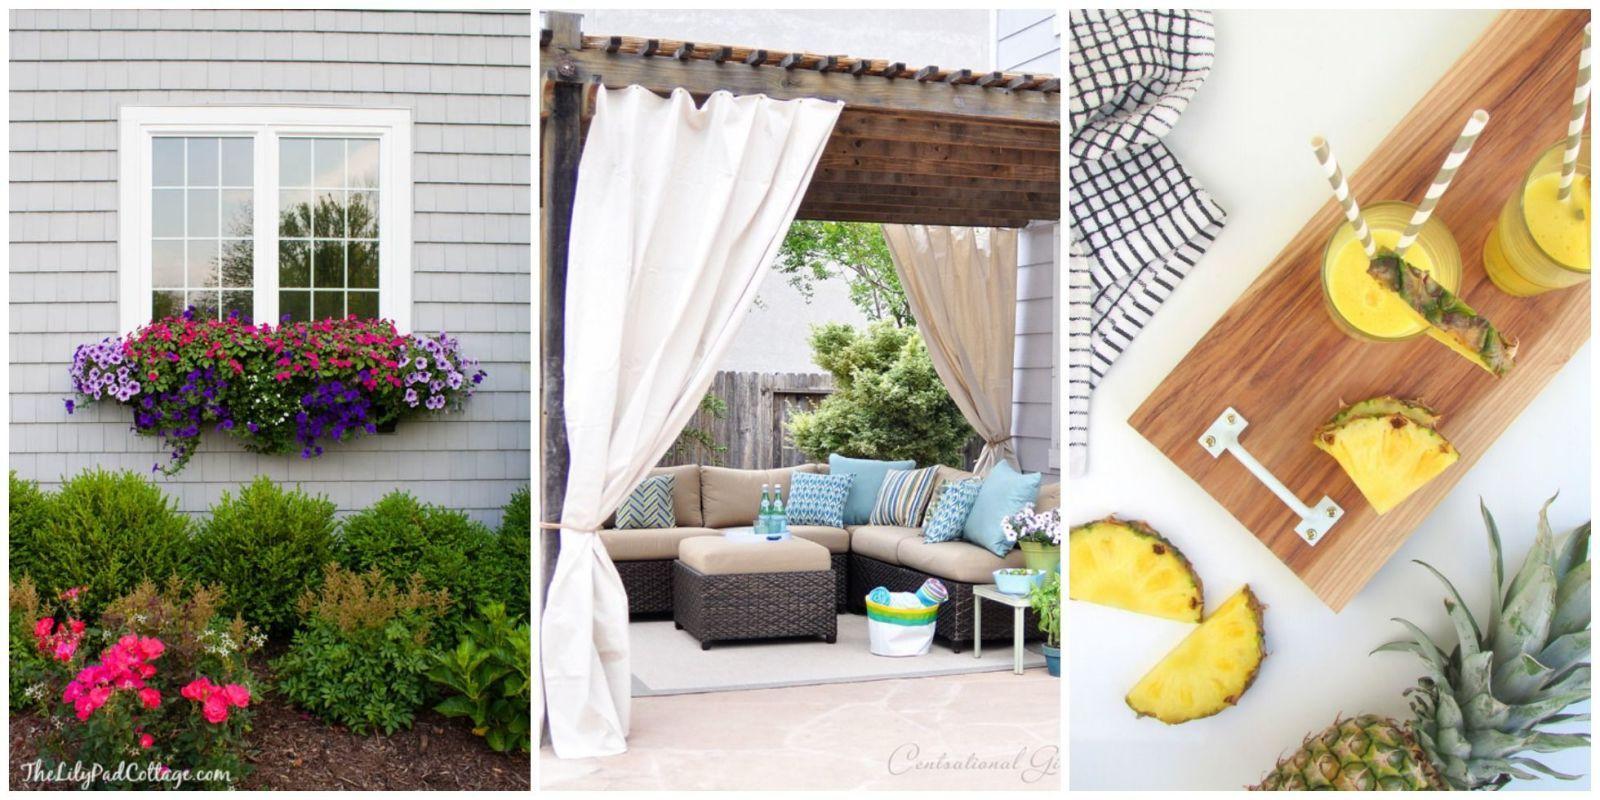 9 DIYs to Cozy Up Your Backyard